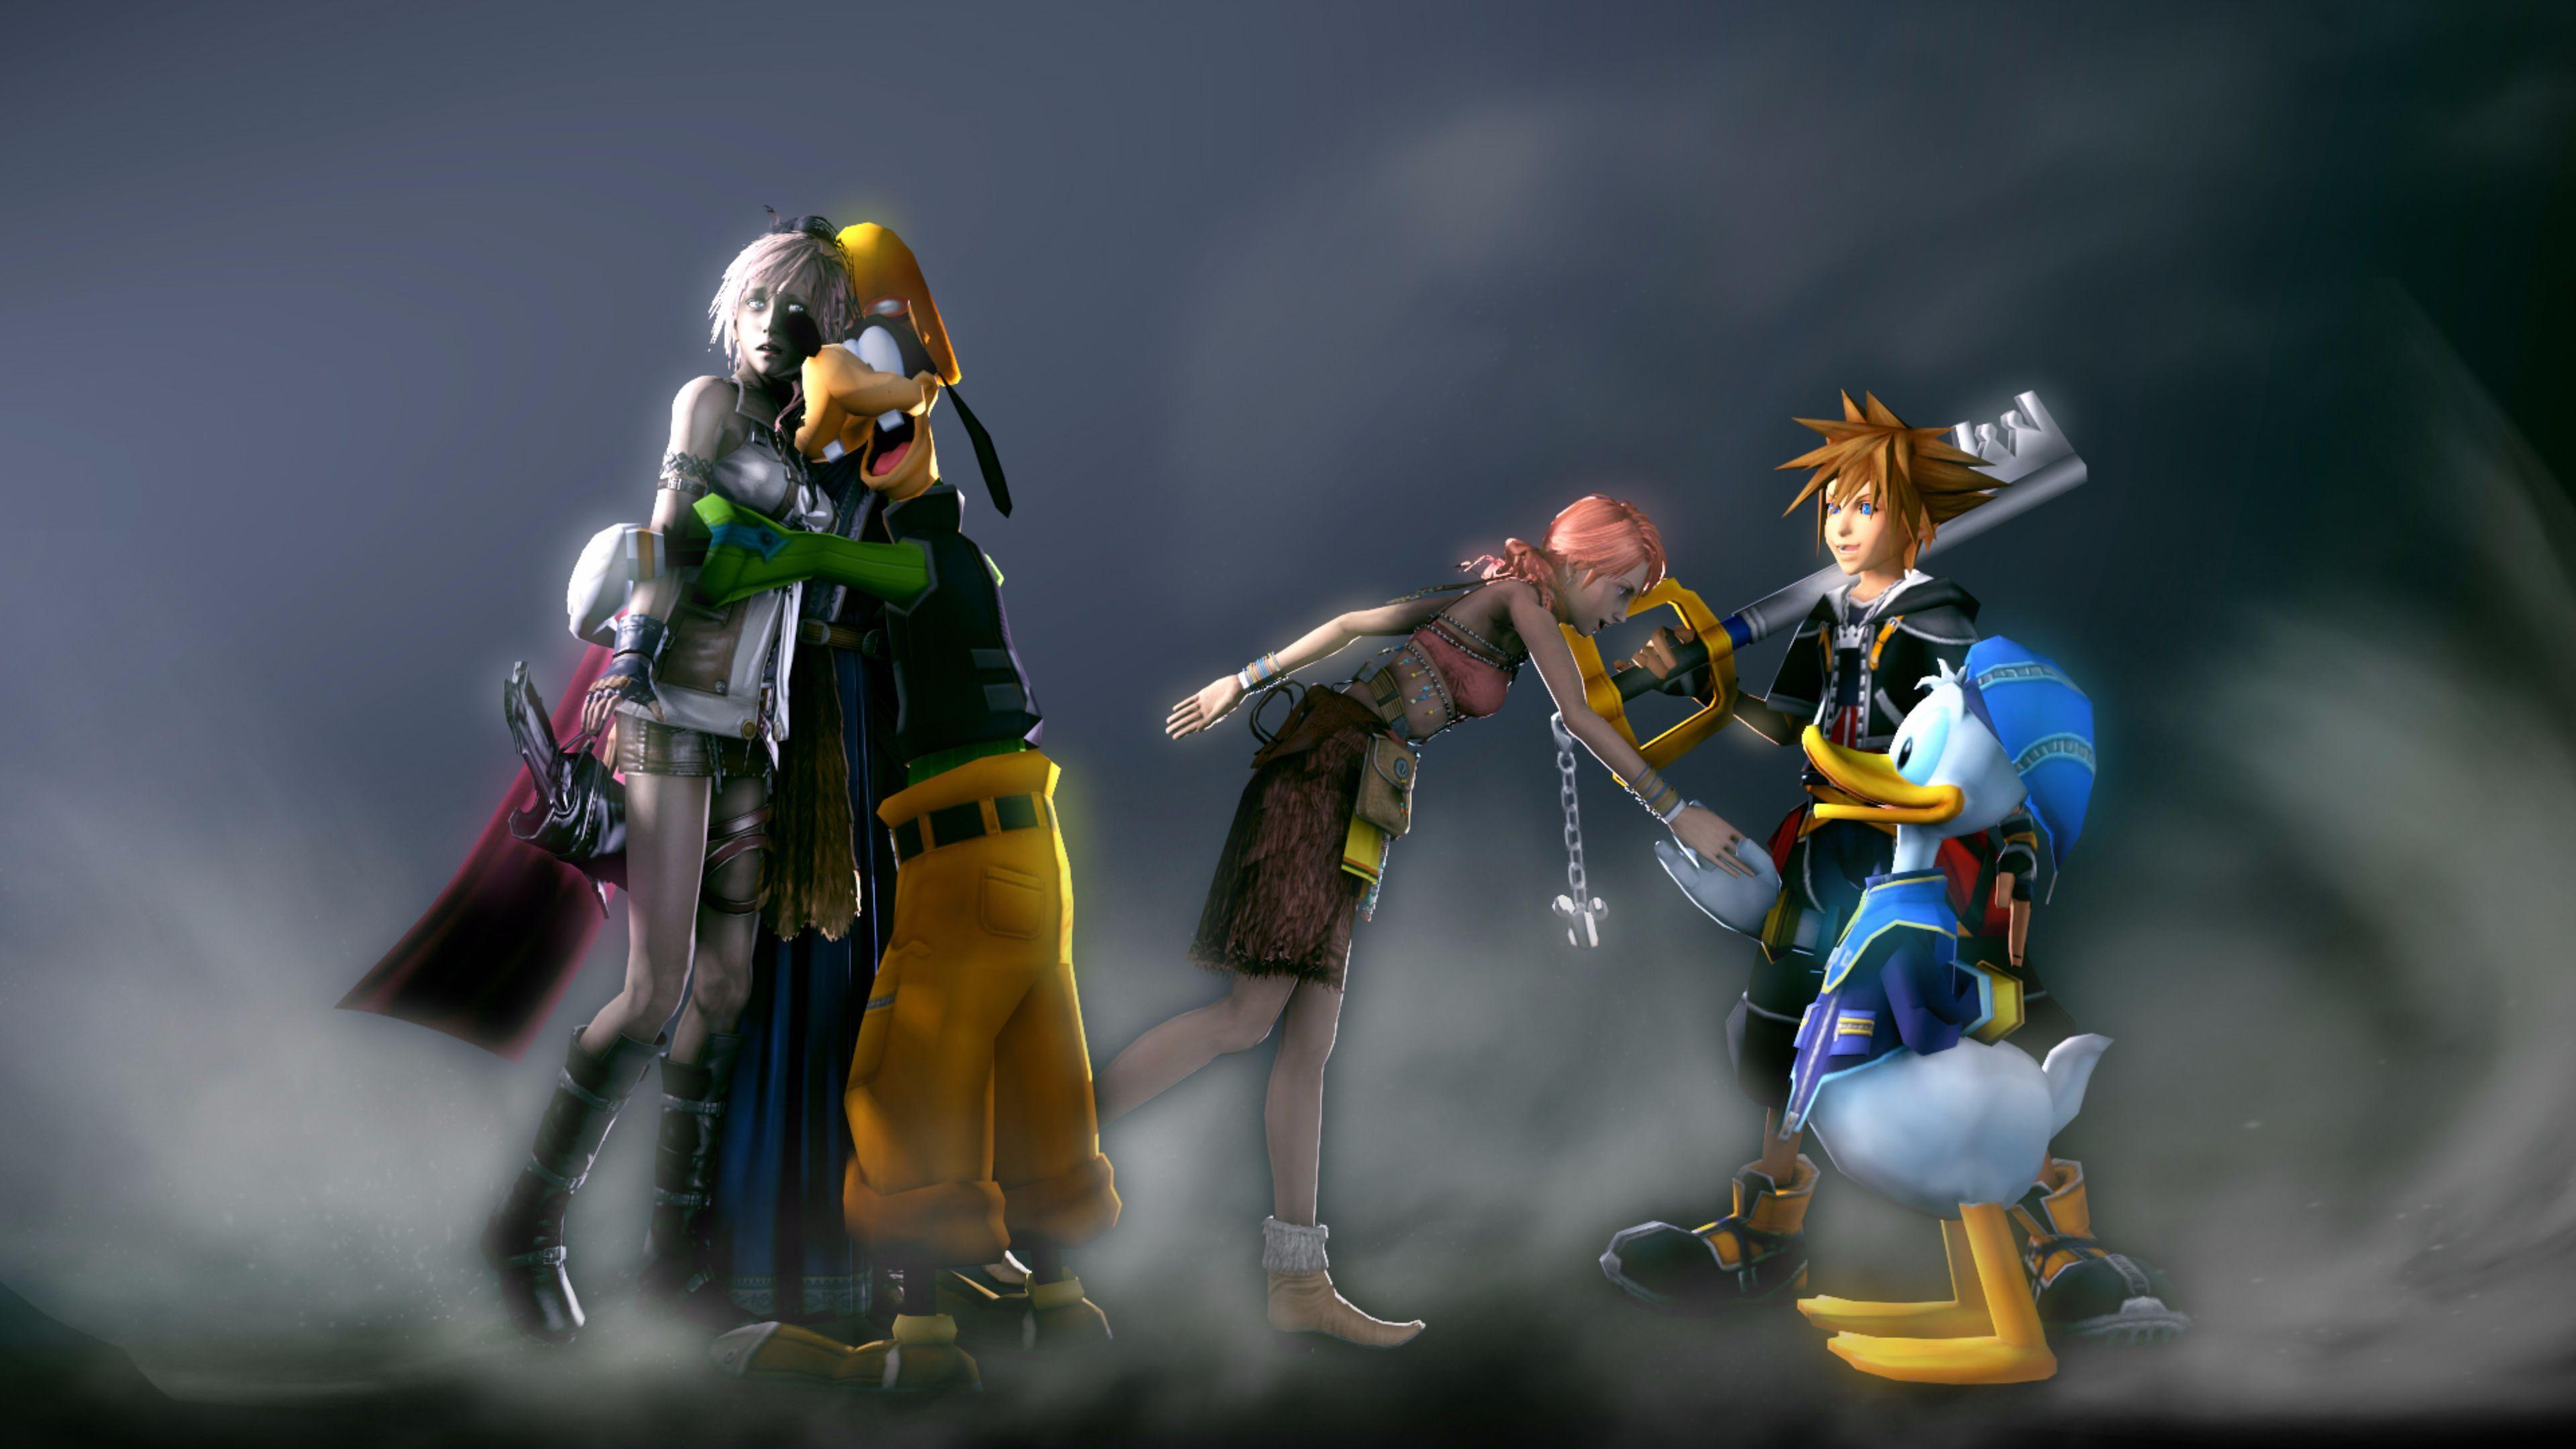 Kingdom Hearts Iii Wallpapers Wallpaper Cave